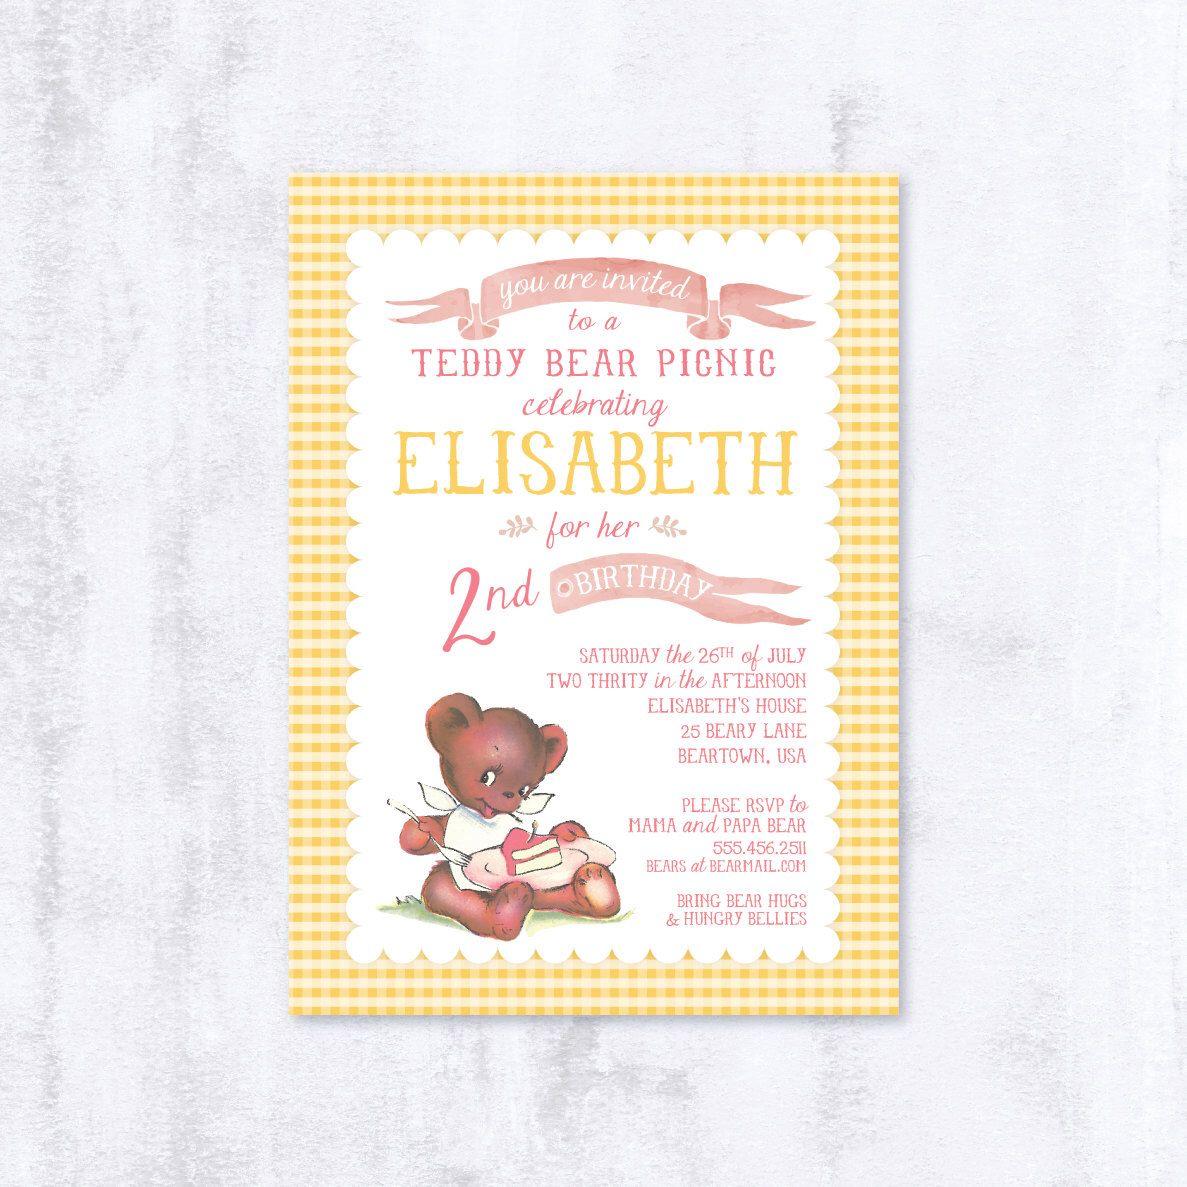 Teddy Bear Picnic - Birthday Party Invitation - Custom Printable ...